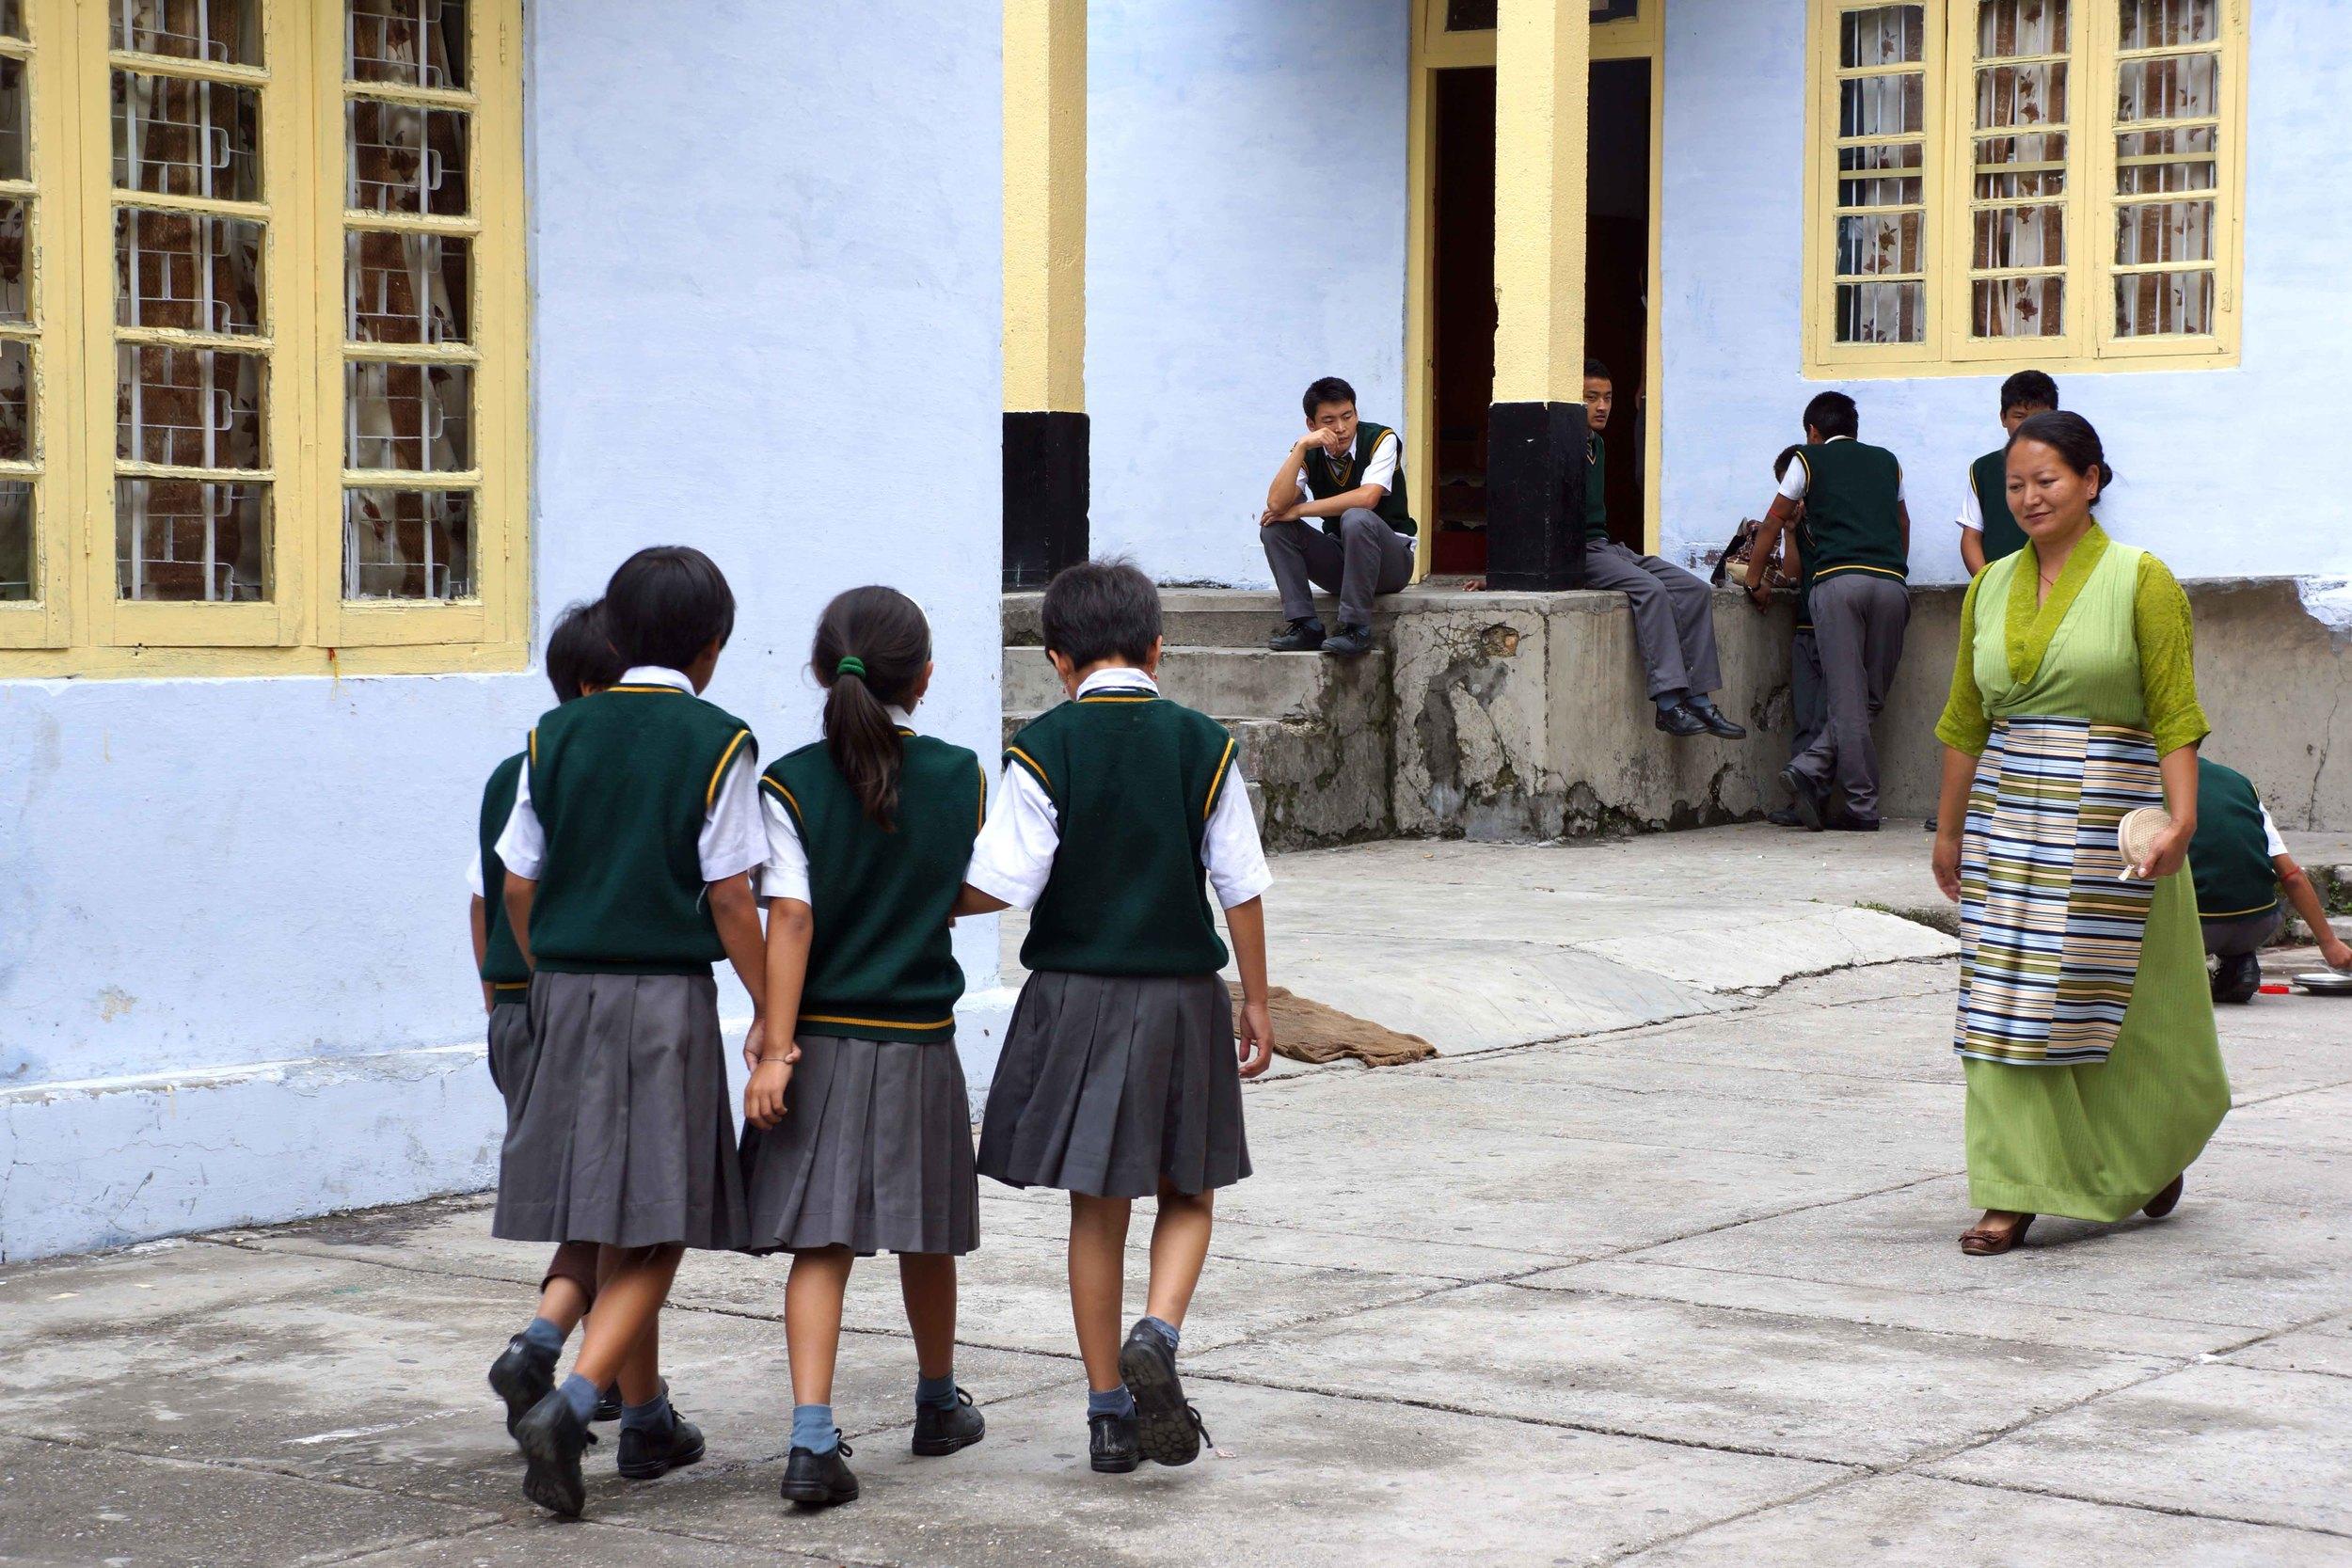 Tibetan schoolchildren walking in a group